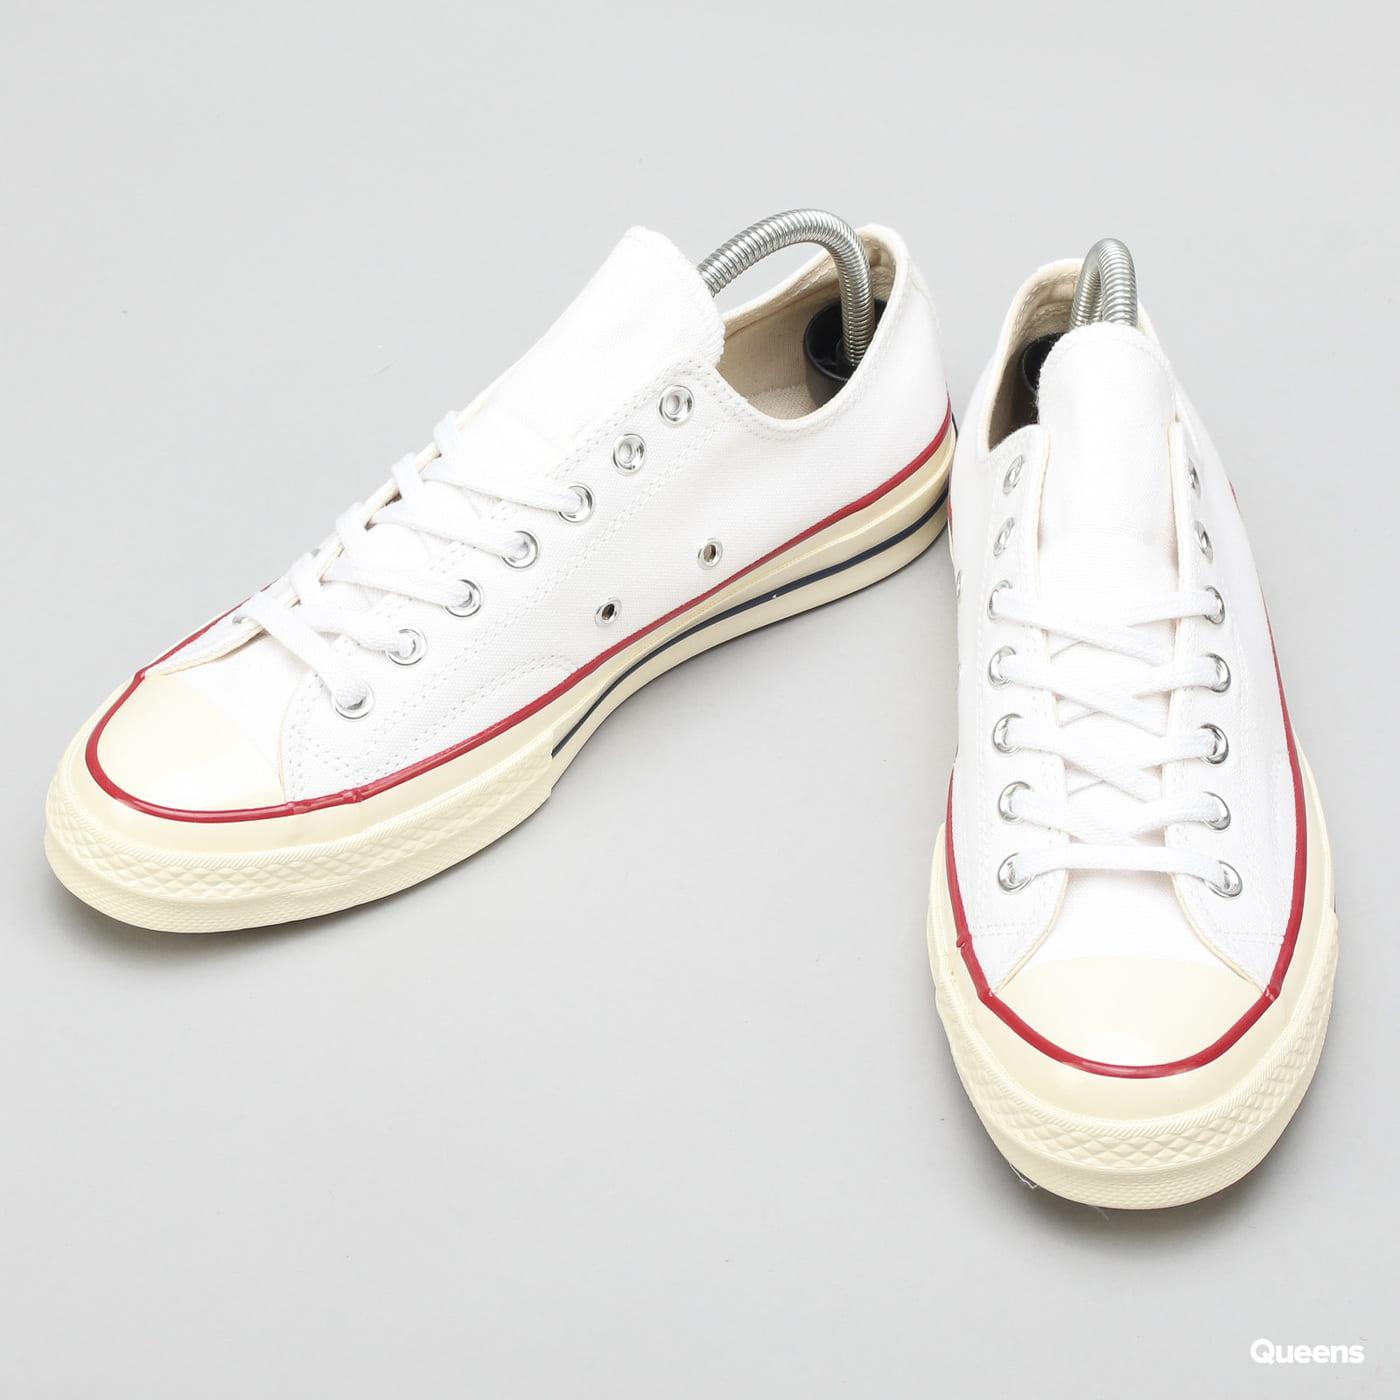 Converse Chuck Taylor All Star 70 OX white garnet egret